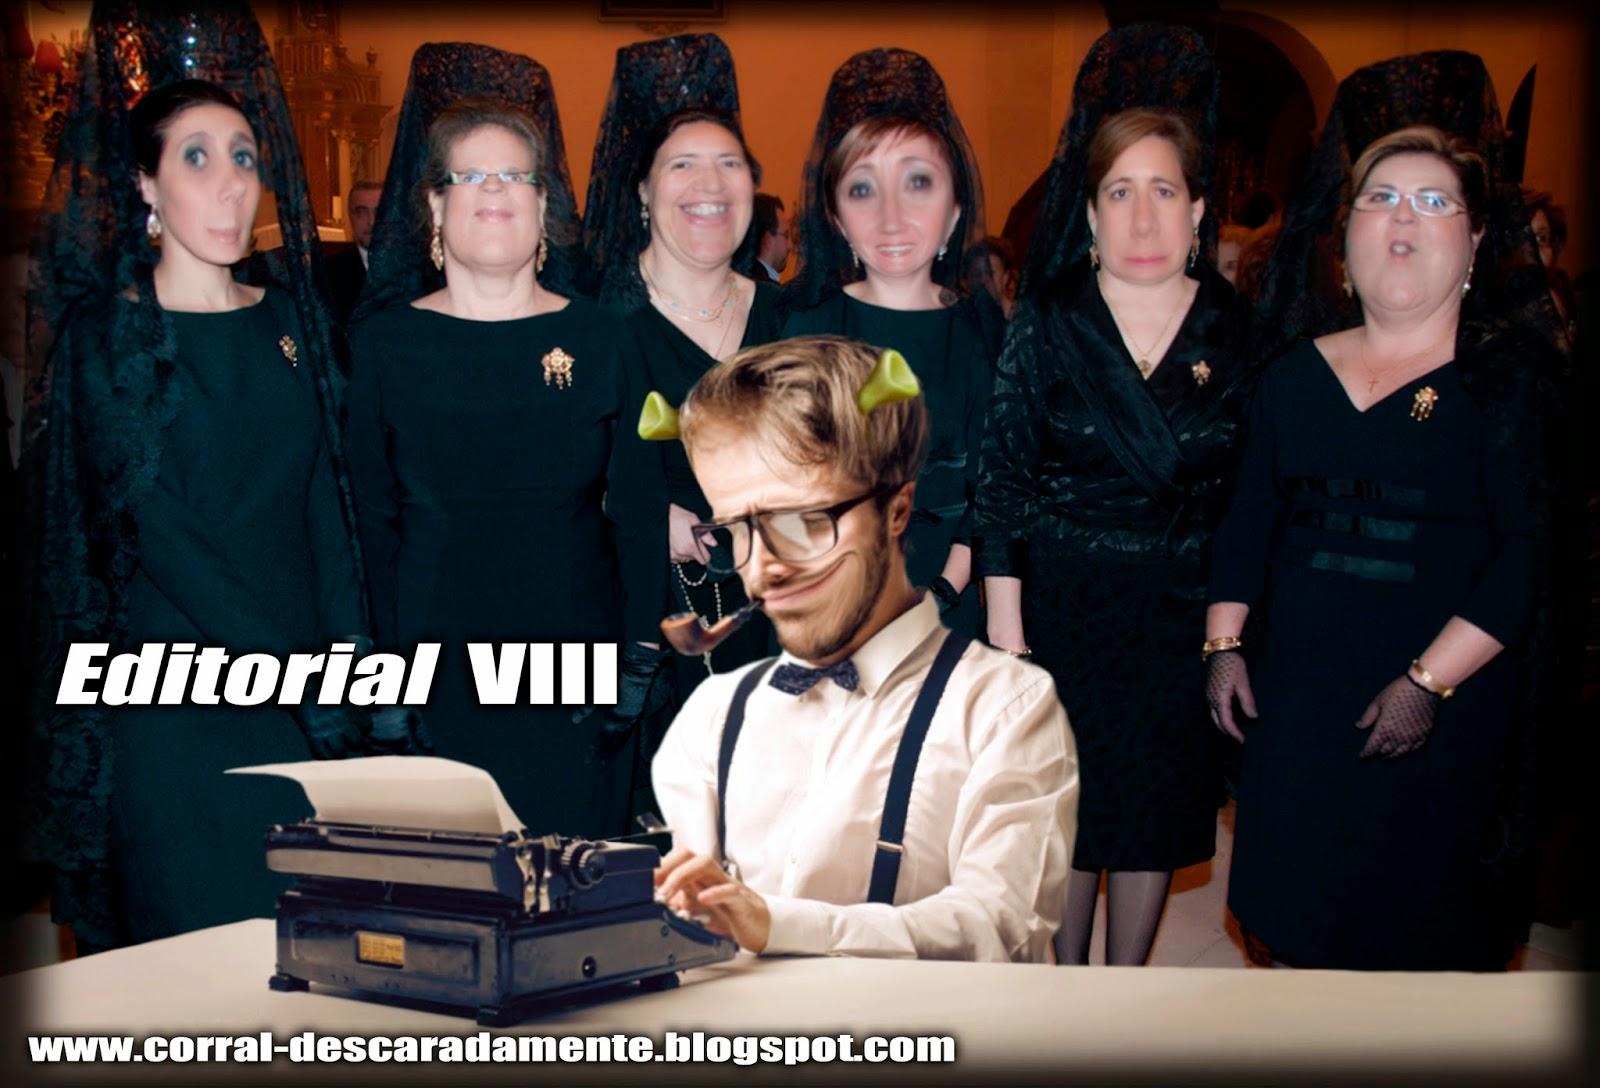 EDITORIAL VIII 13/04/2015